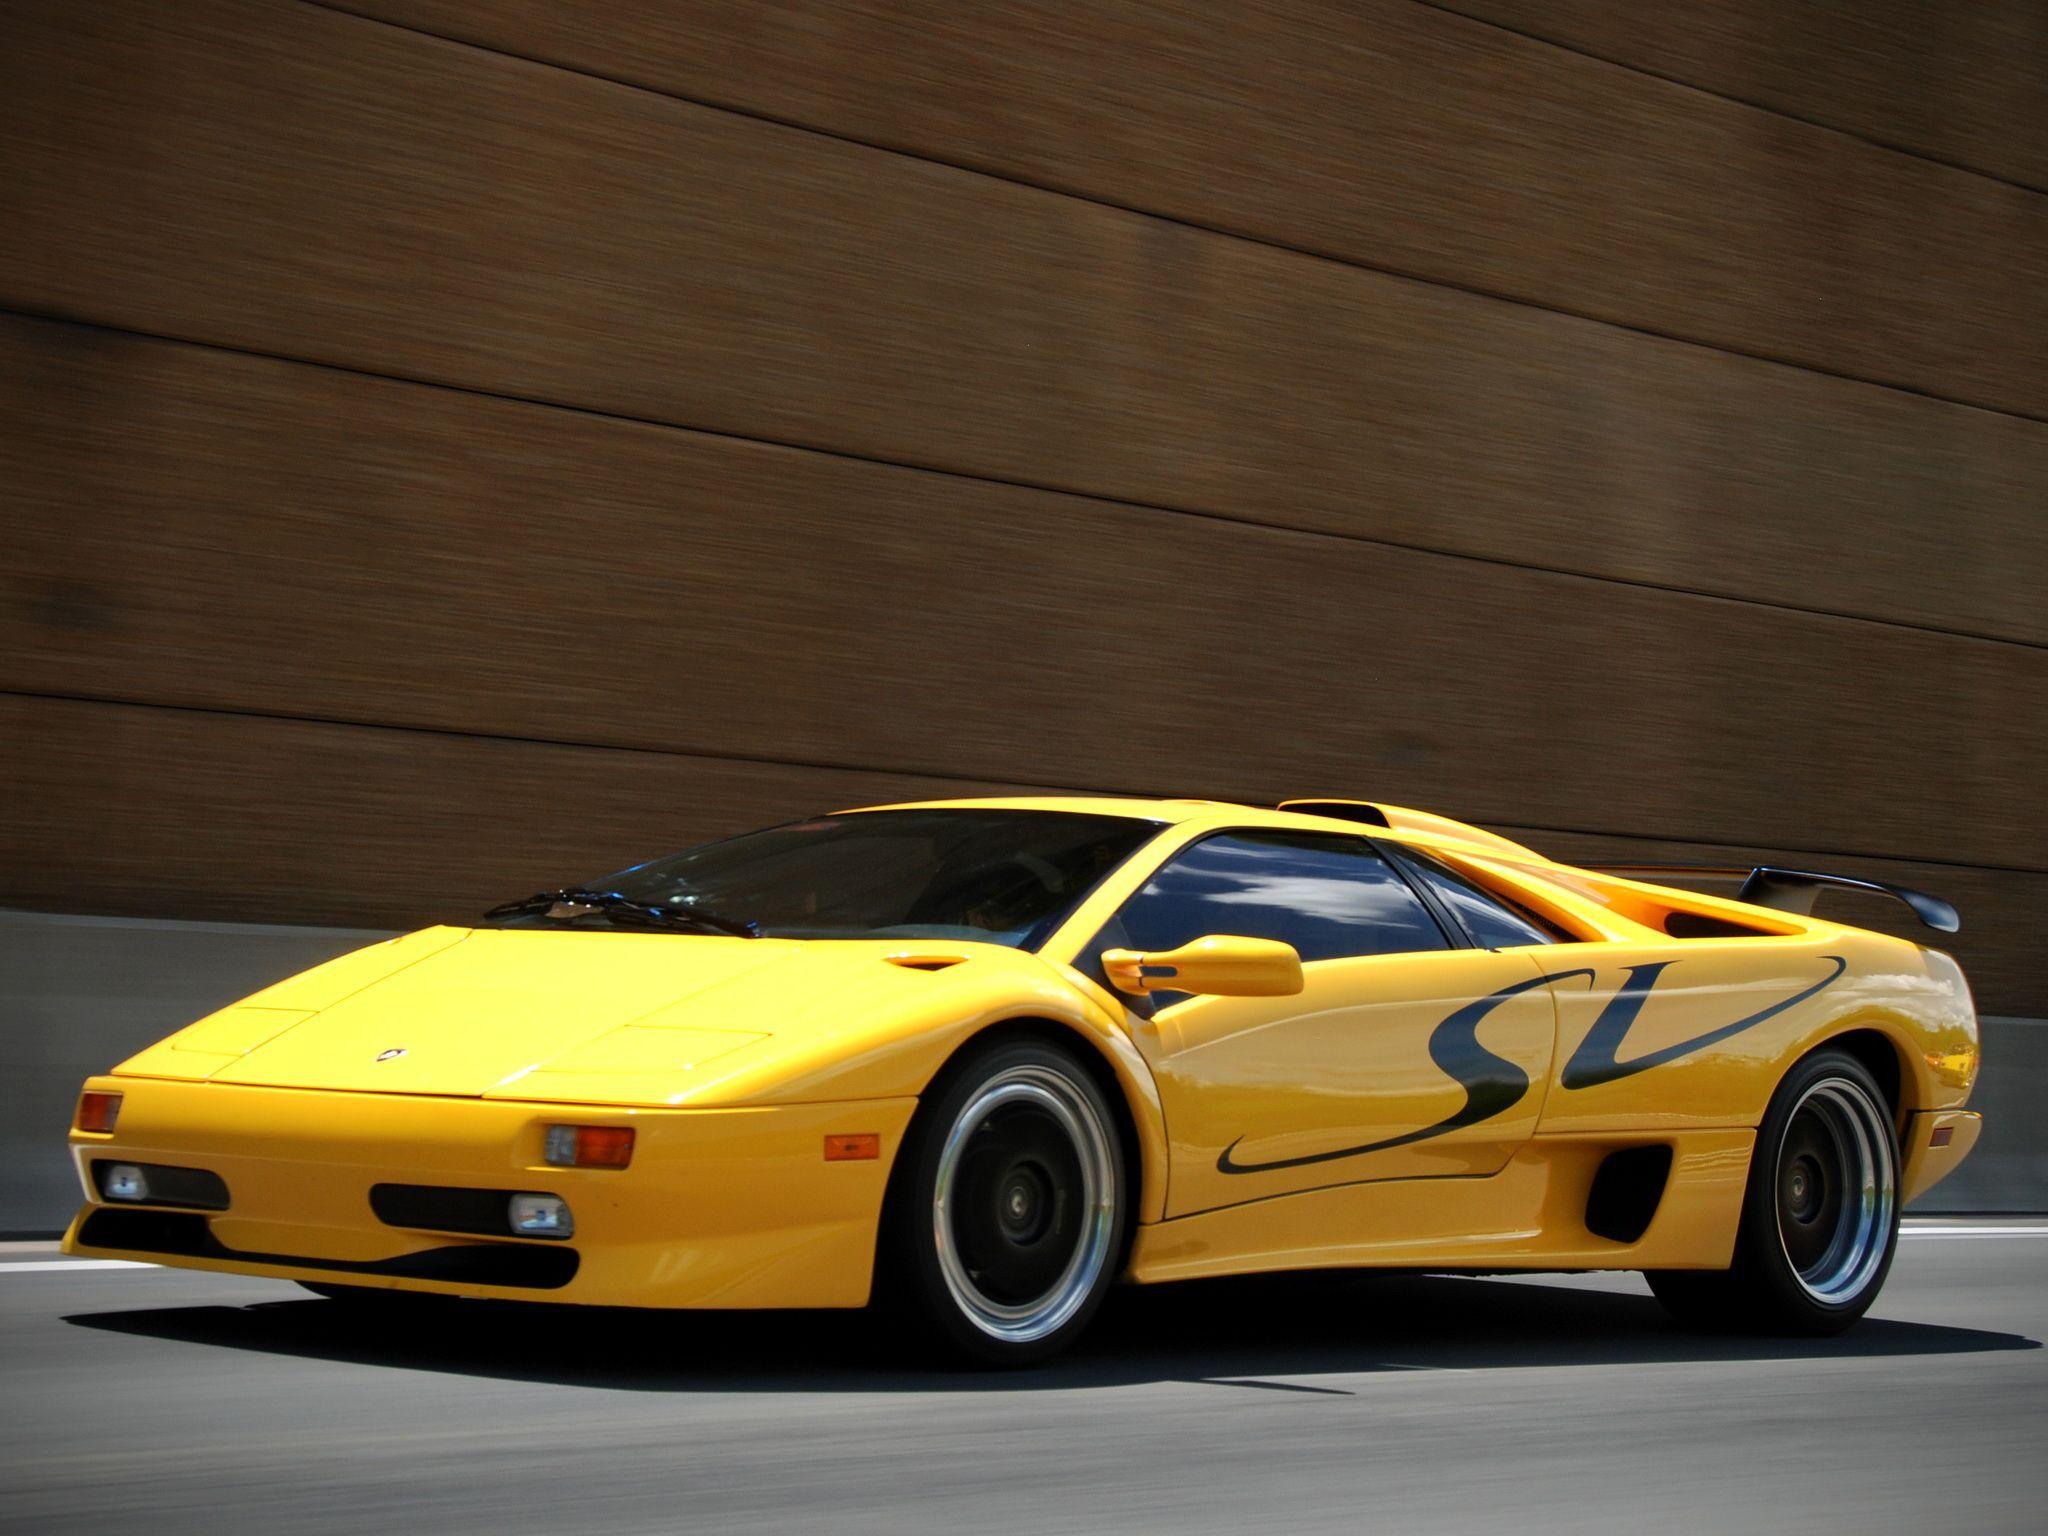 New Lamborghini Diablo Photos And Pictures Lamborghini Diablo Hq